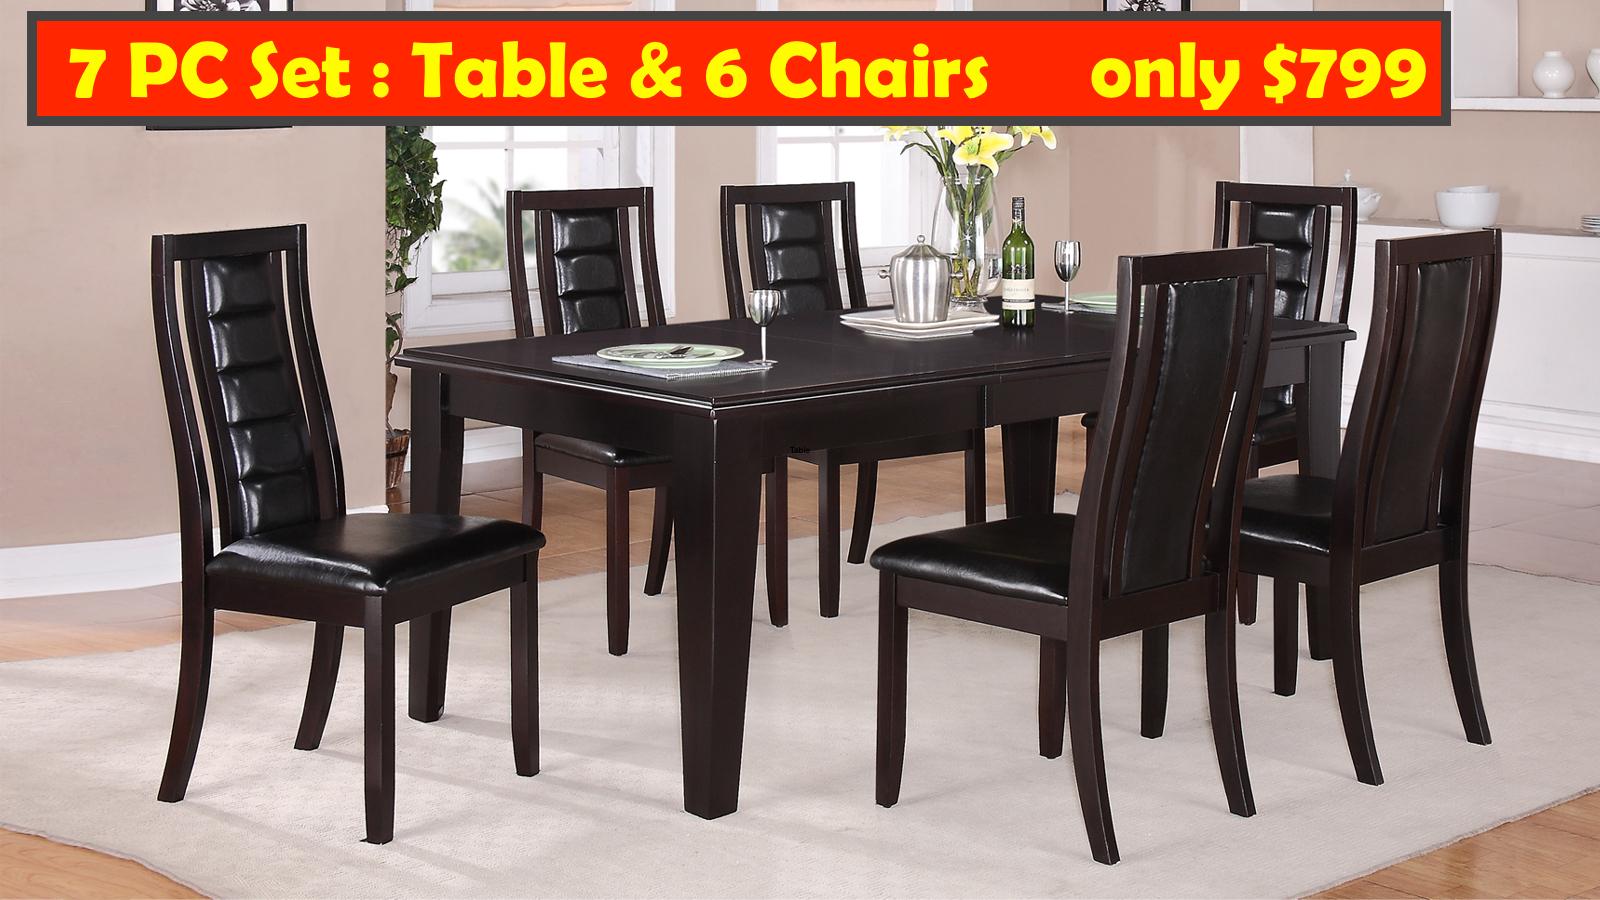 American furniture design ewing township nj discount for Affordable furniture nj